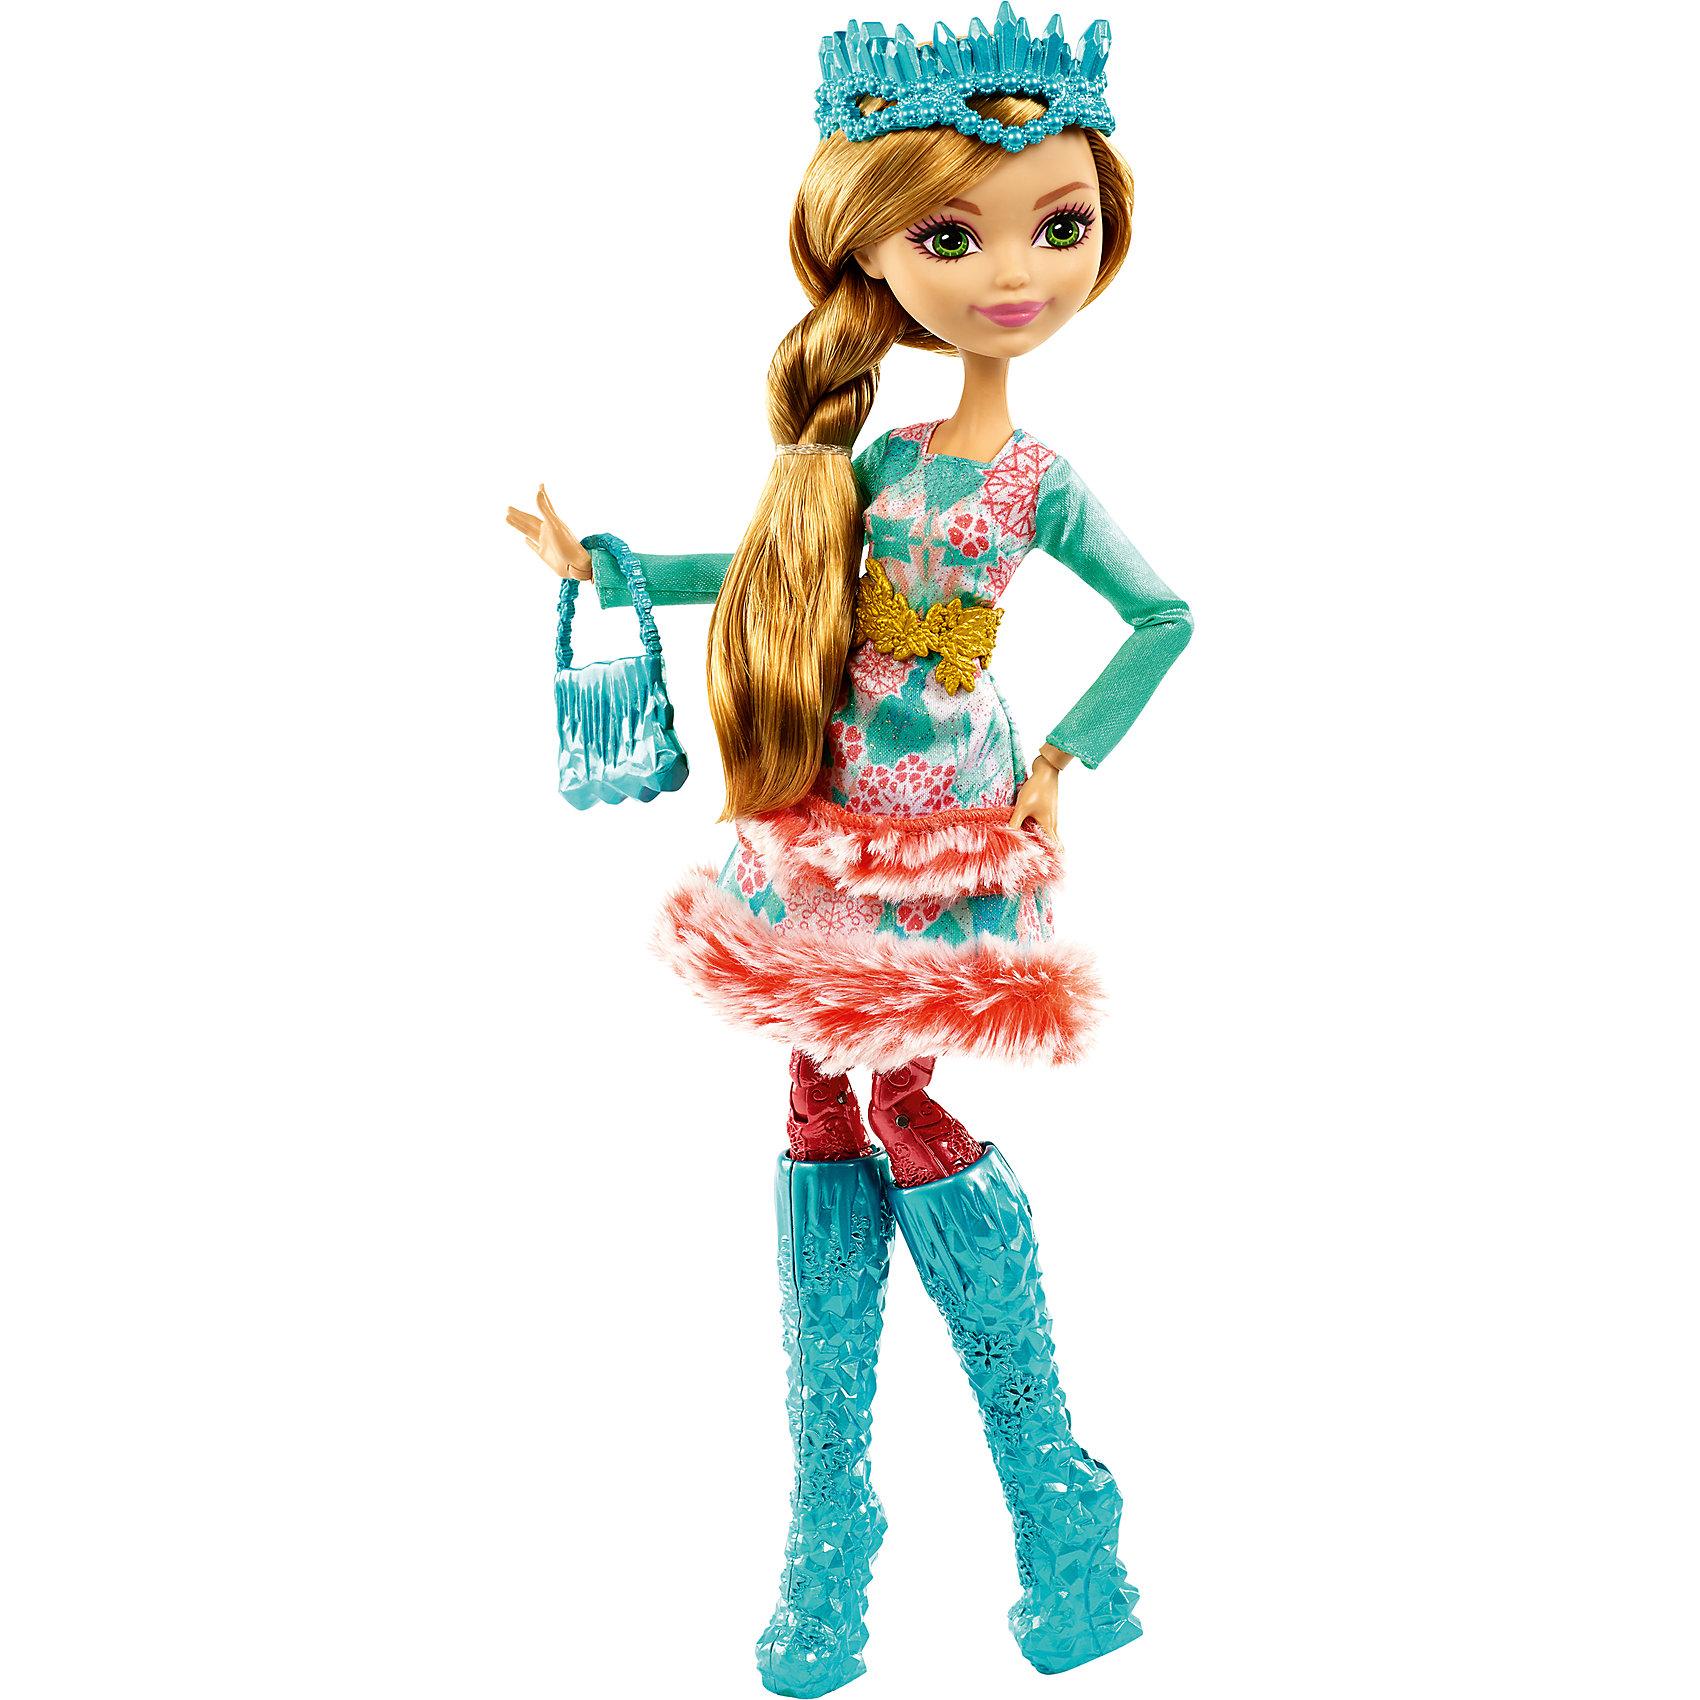 Mattel Кукла Эшлин Элла из коллекции Заколдованная зима, Ever After High mattel ever after high эшлин элла